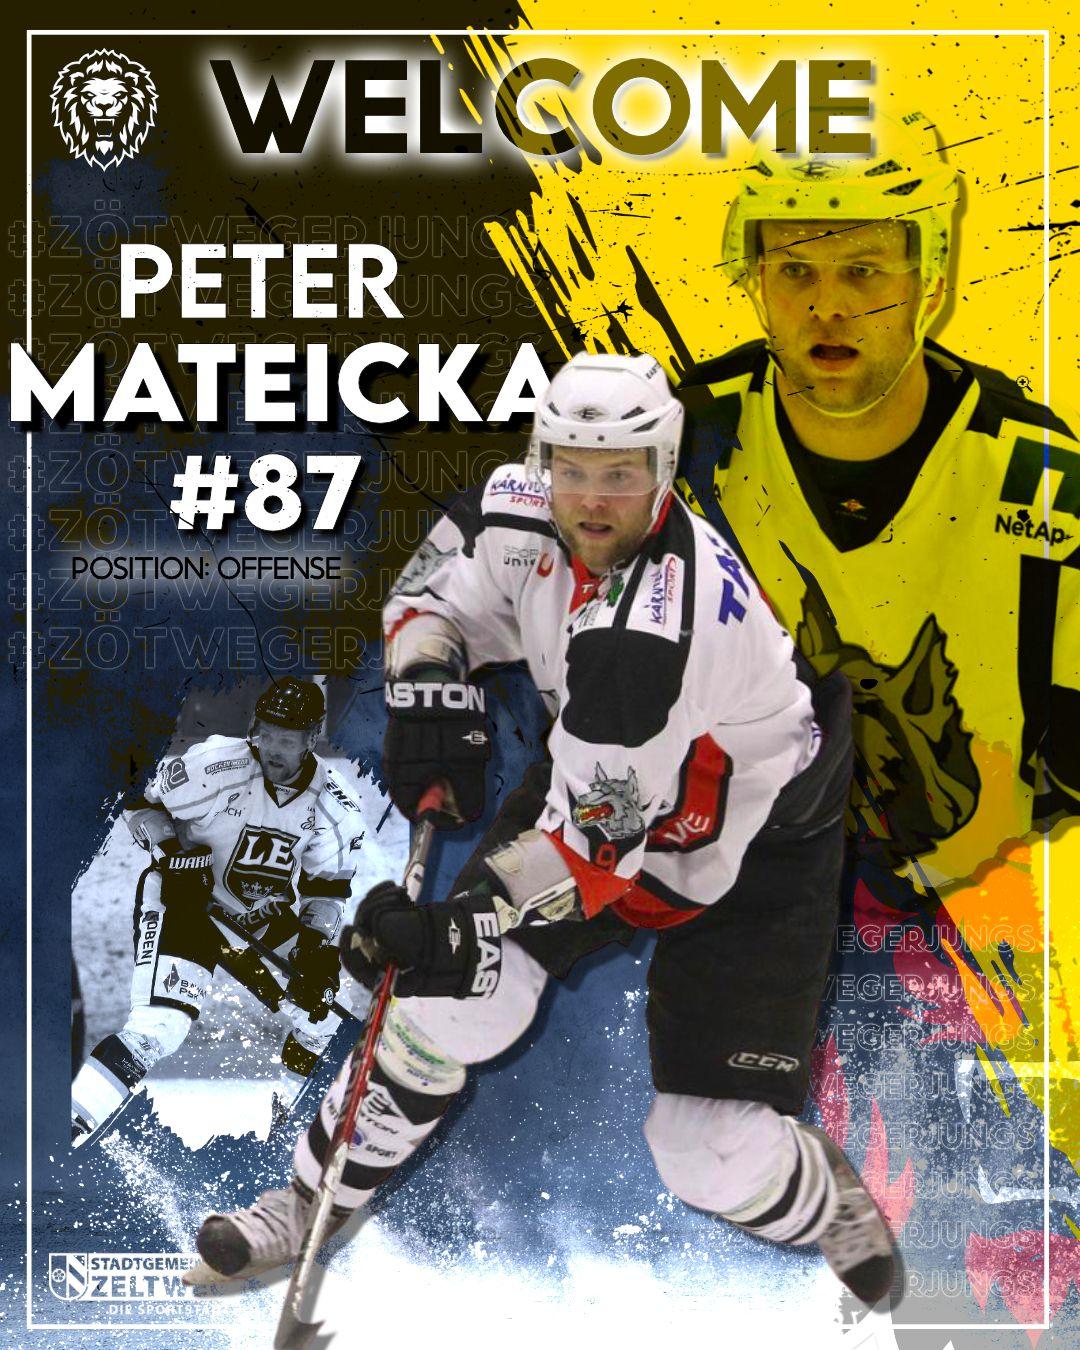 Peter_Mateicka